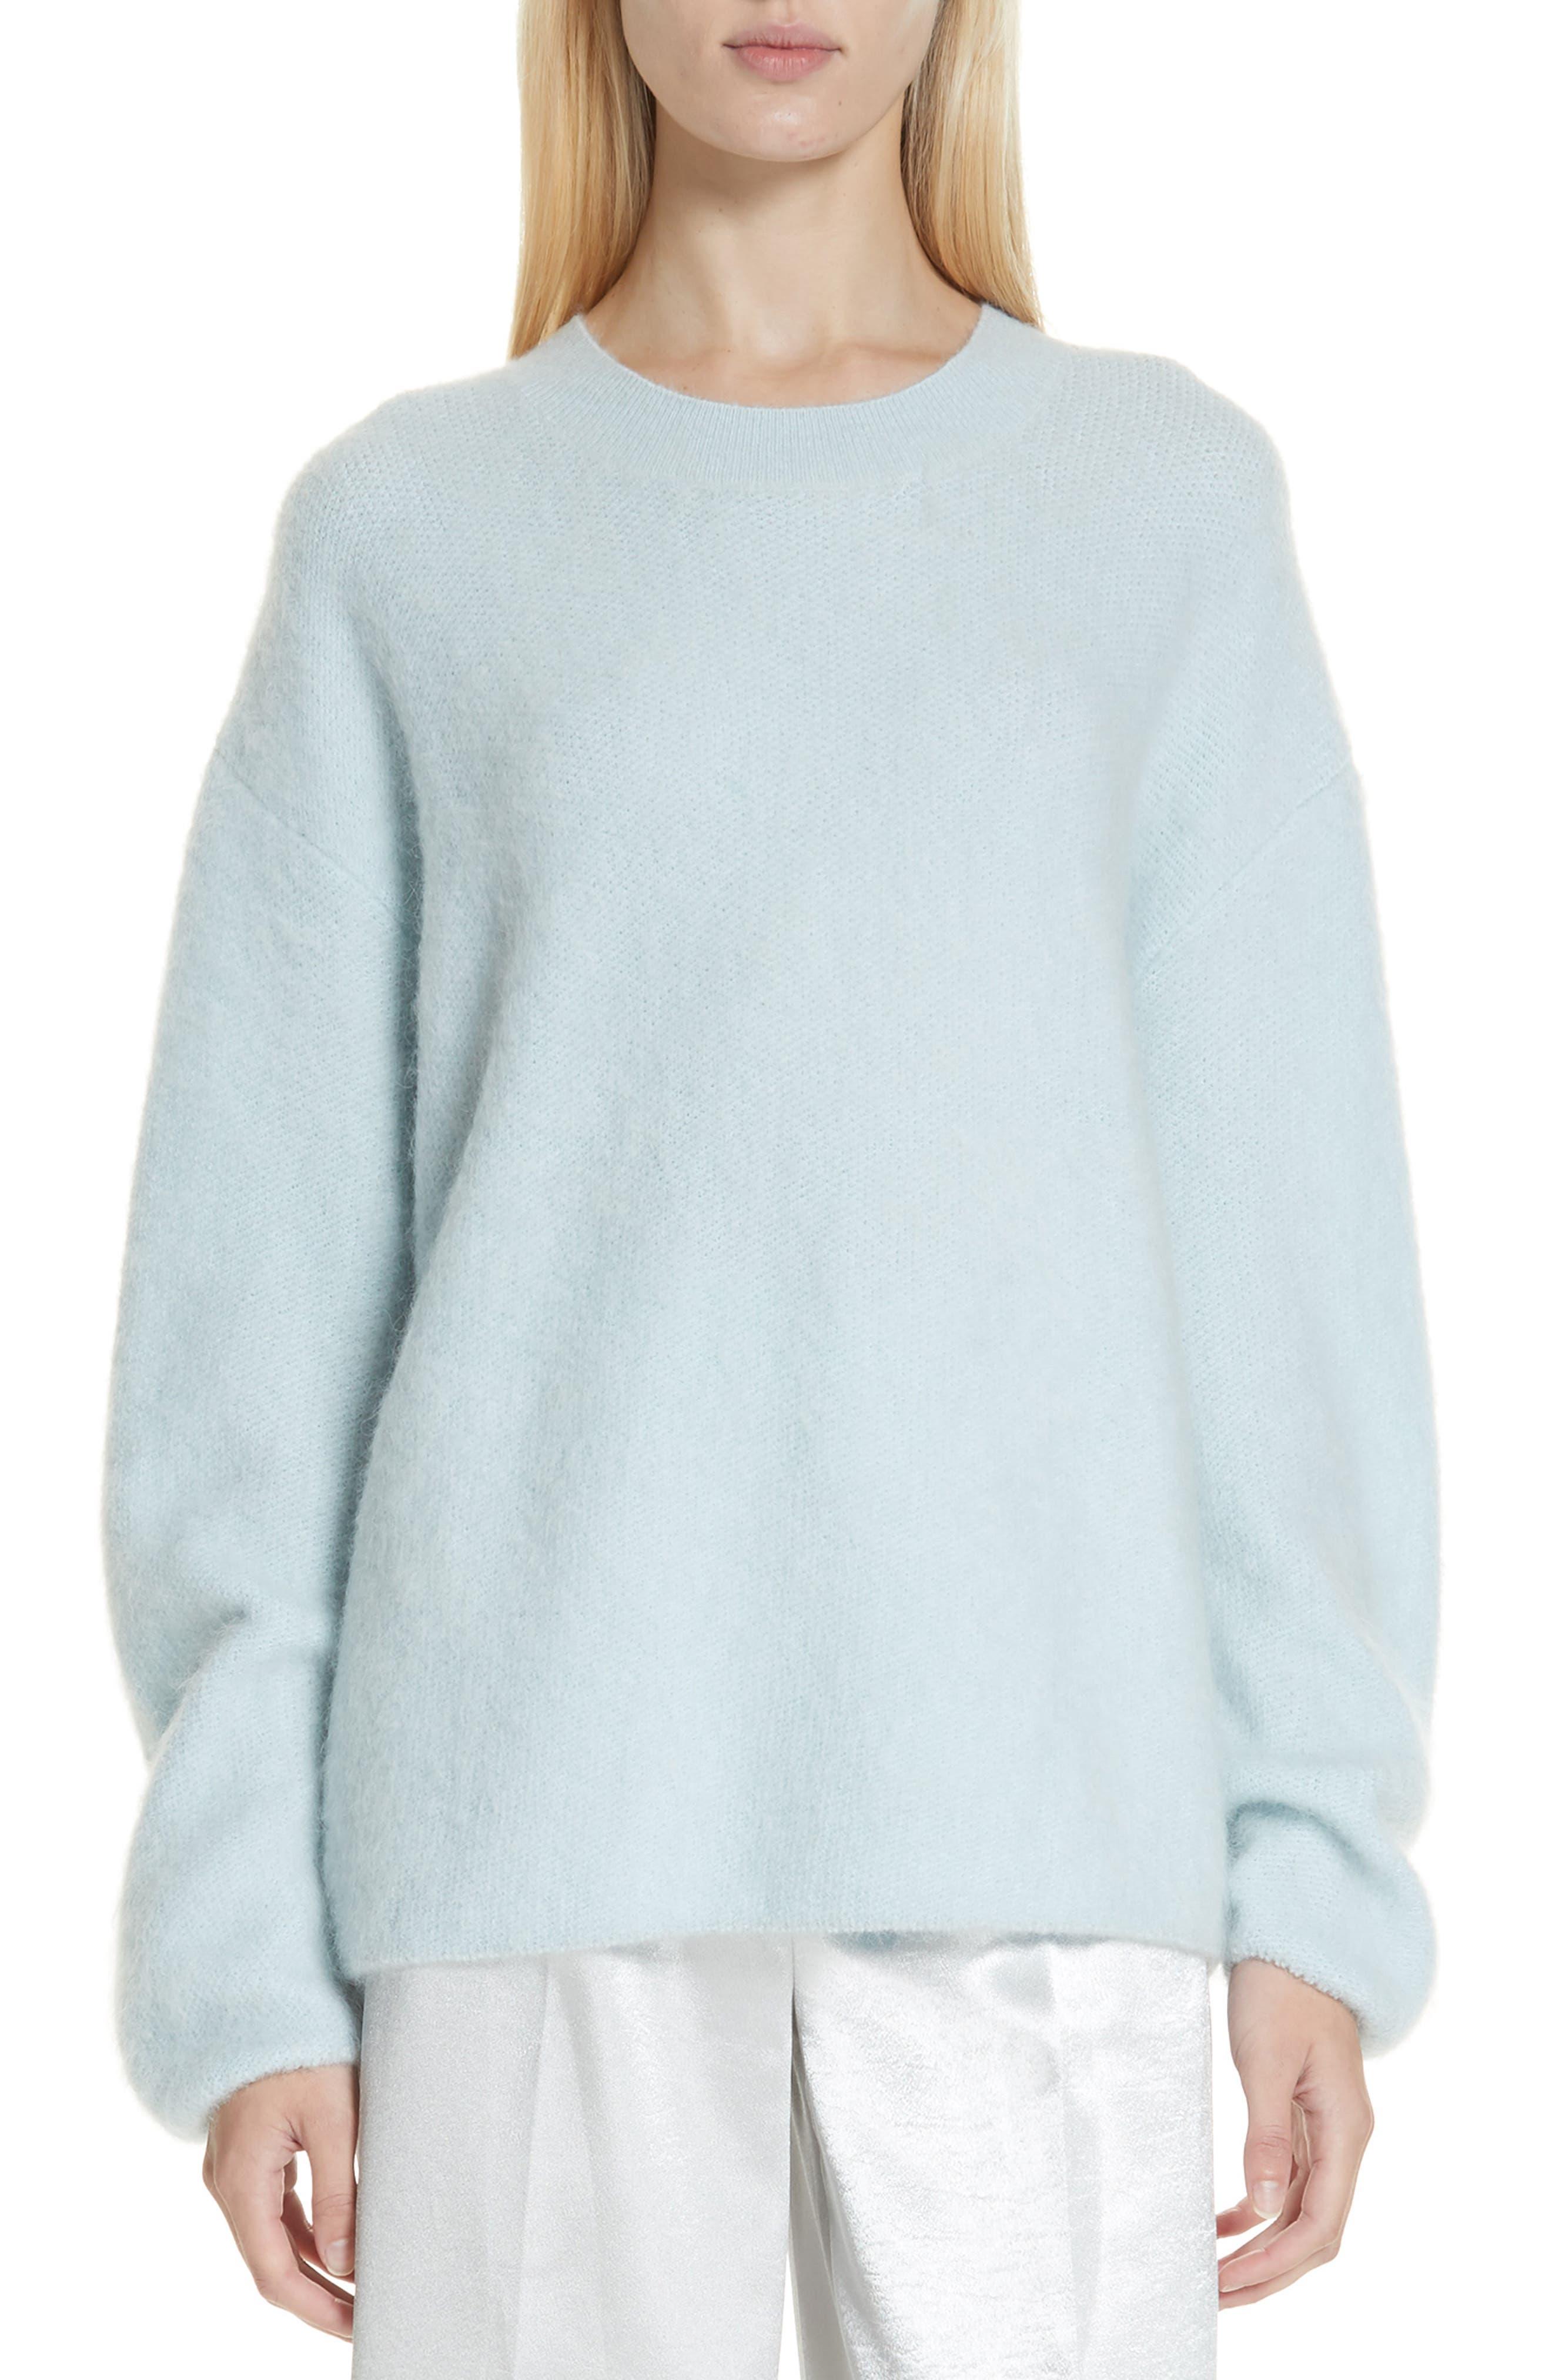 VINCE Oversize Sweater, Main, color, ICE/ BLUE